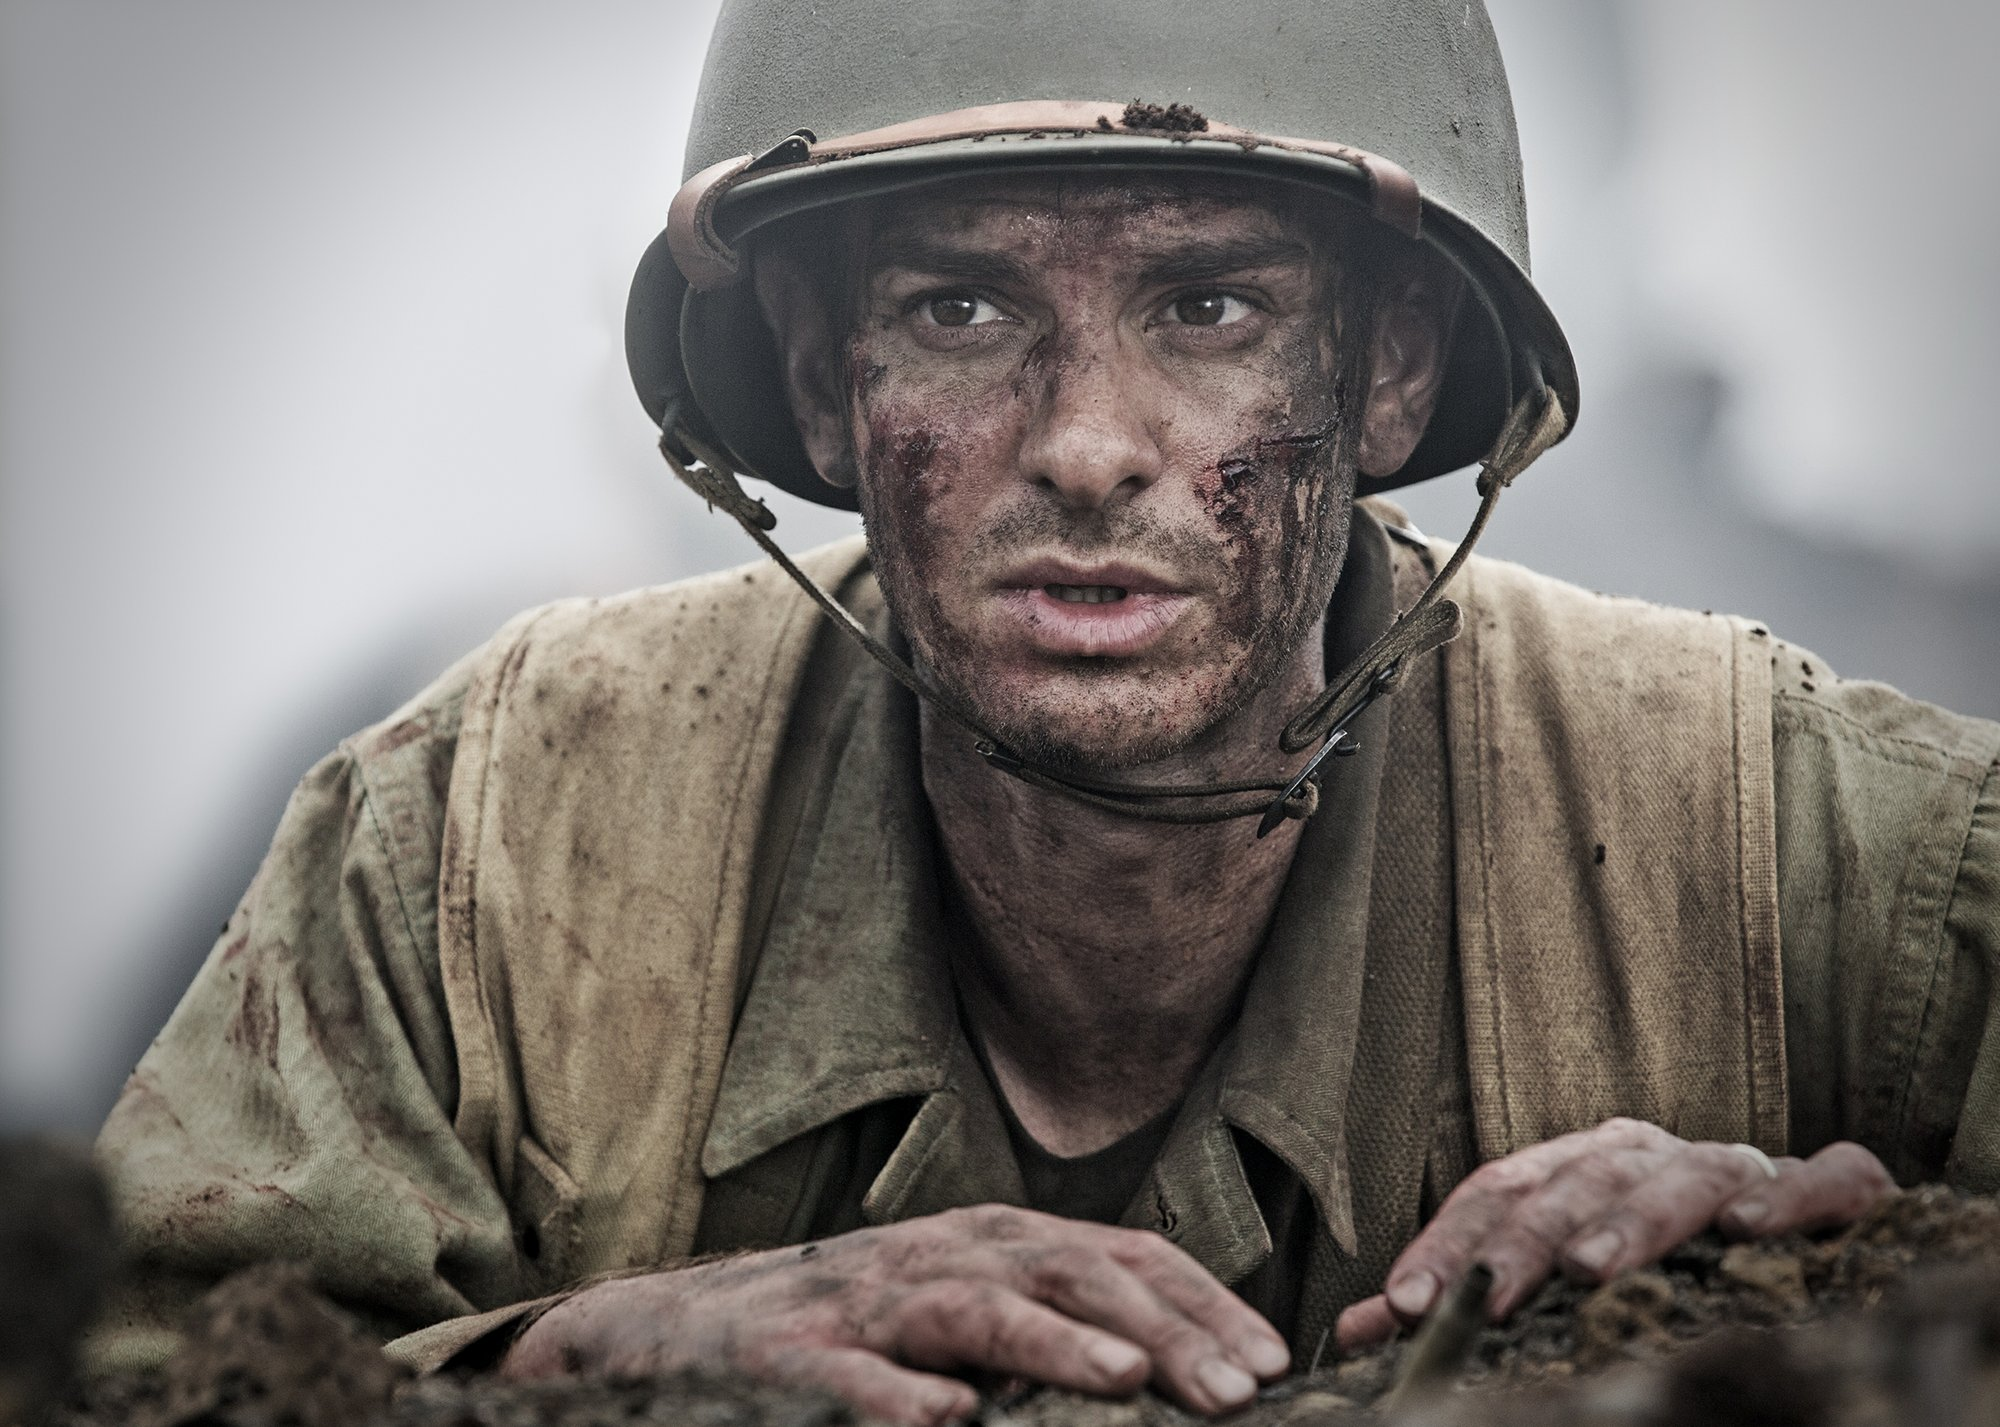 Review: Mel Gibson roars back with bruising 'Hacksaw Ridge'